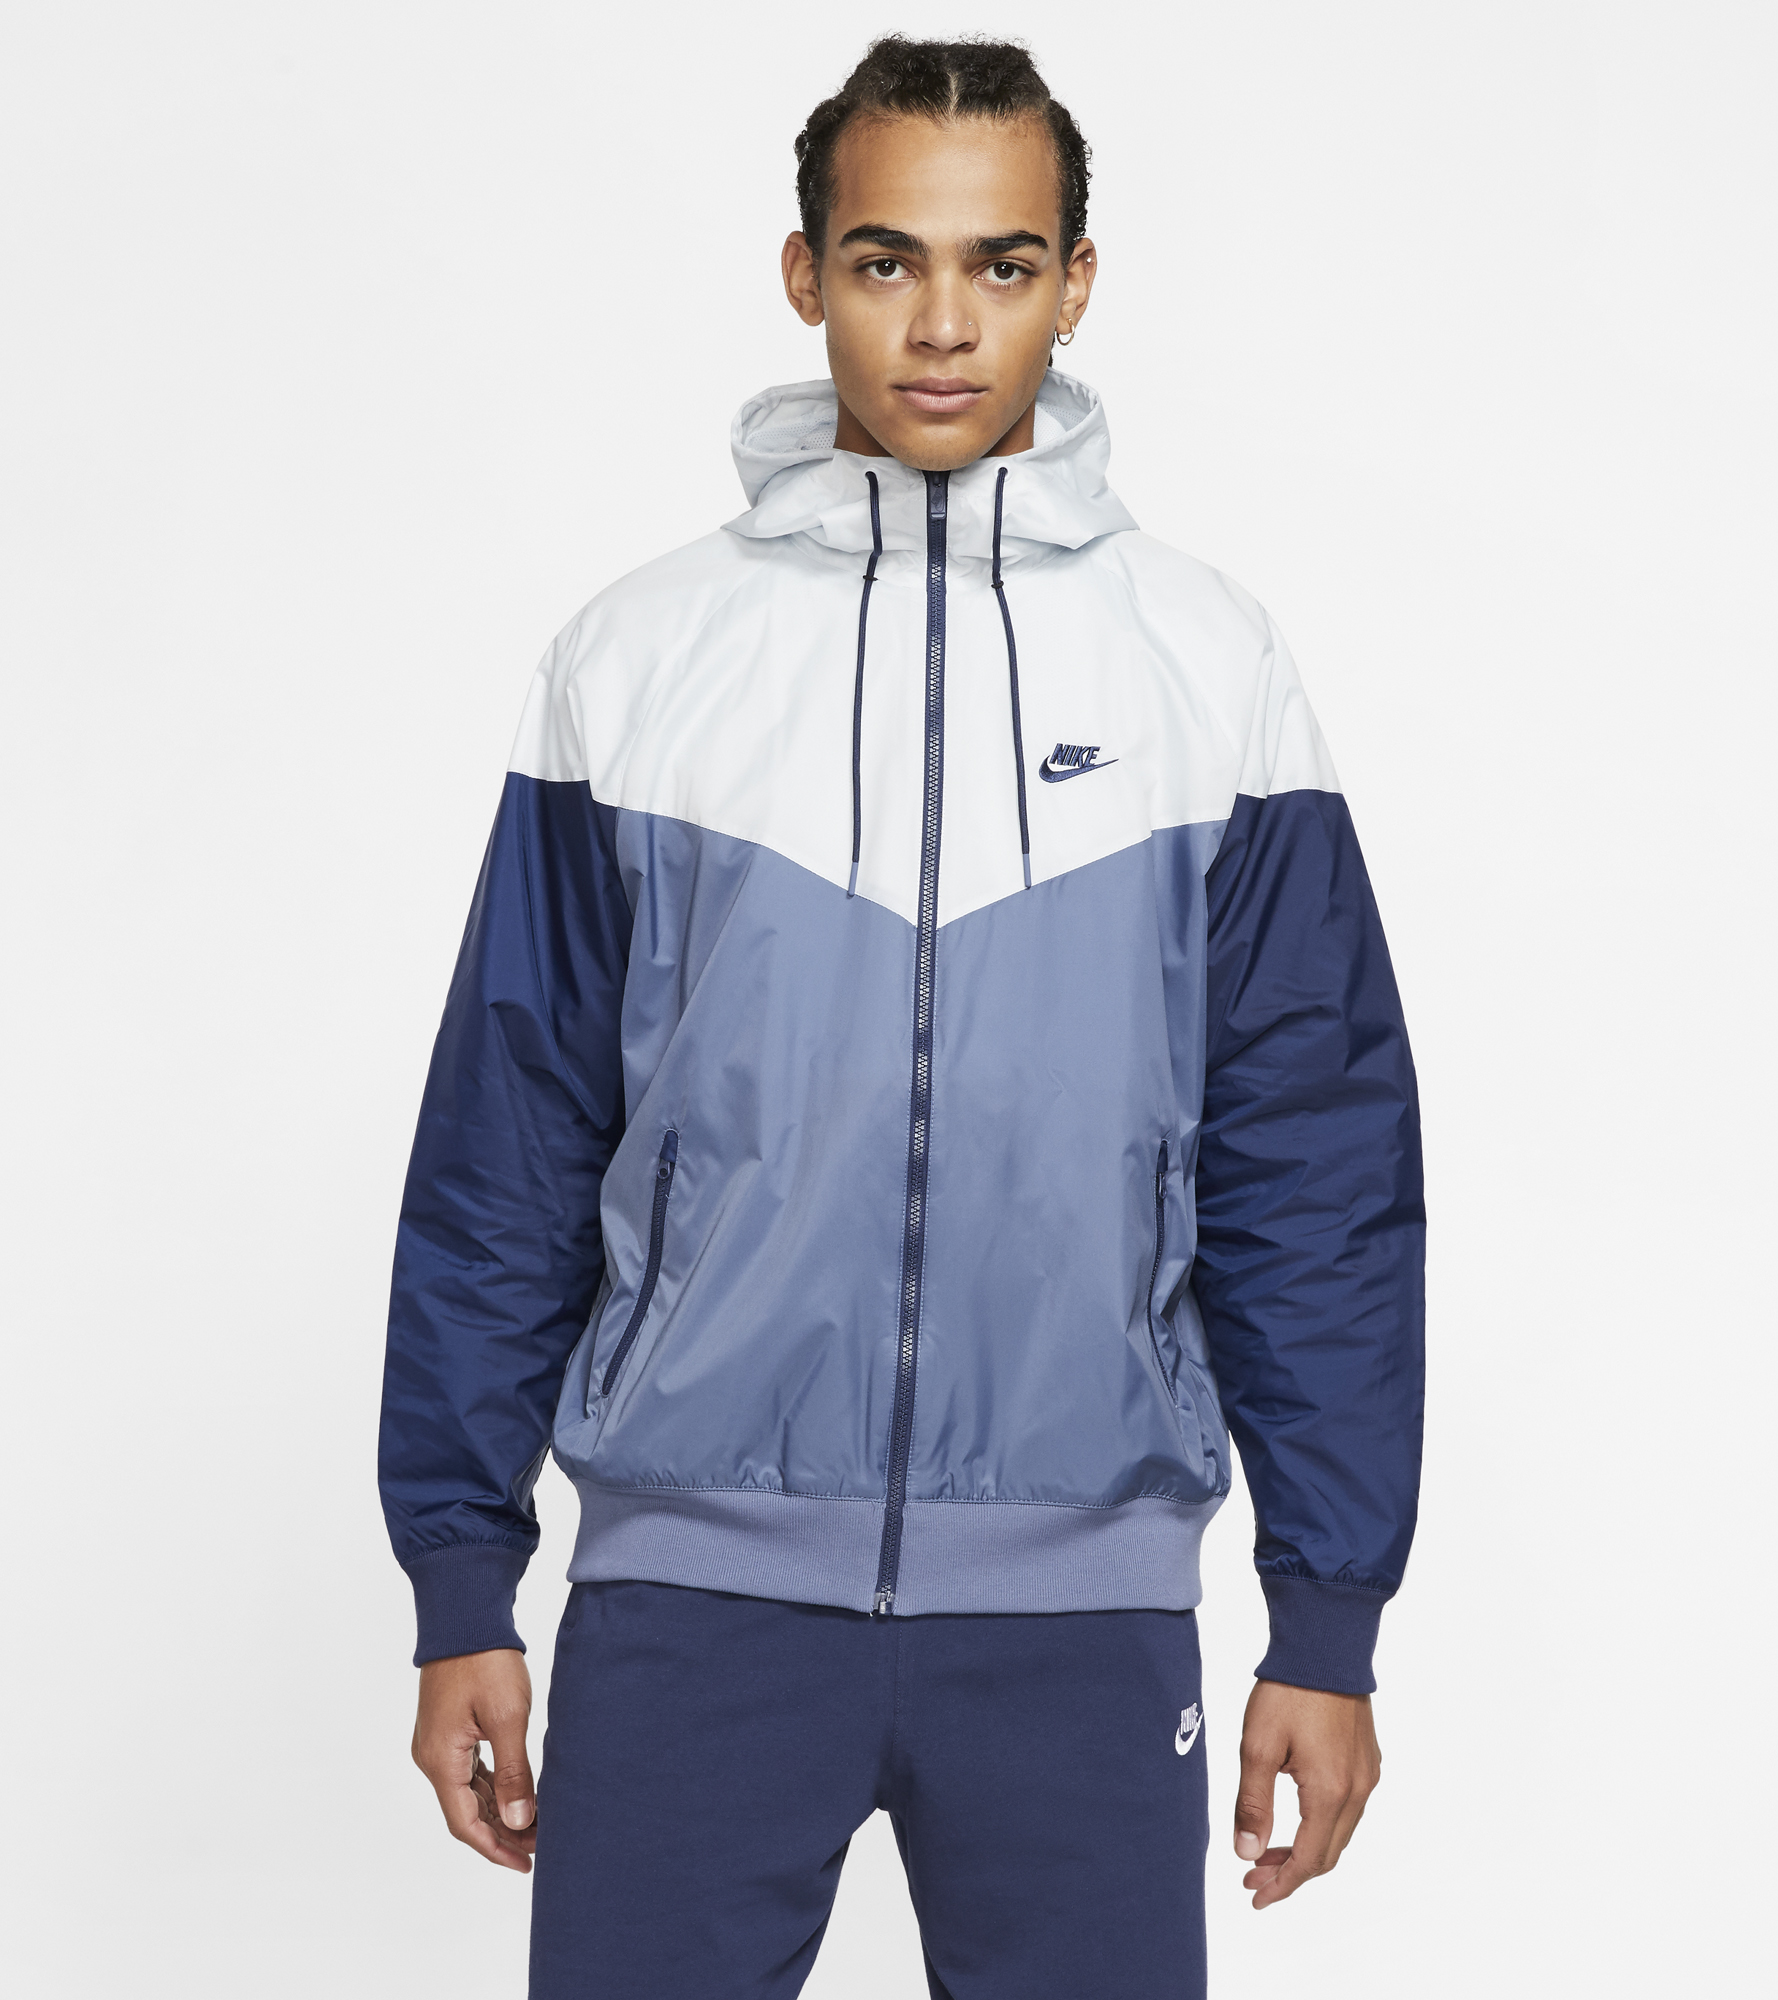 цена Nike Ветровка мужская Nike Sportswear Windrunner, размер 46-48 онлайн в 2017 году